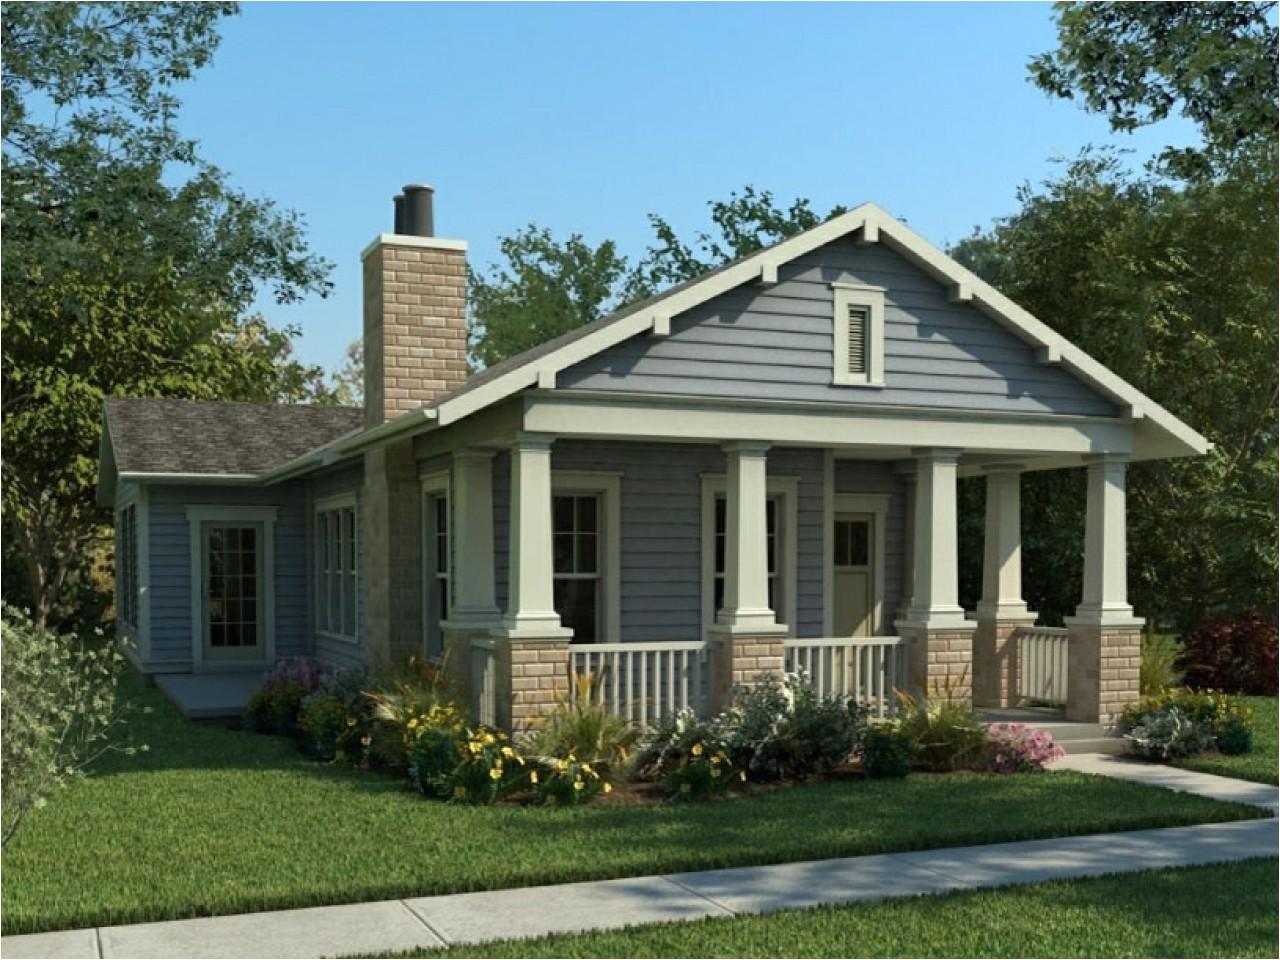 ac148015b50b8dc1 new craftsman style home plans new craftsman style home plans